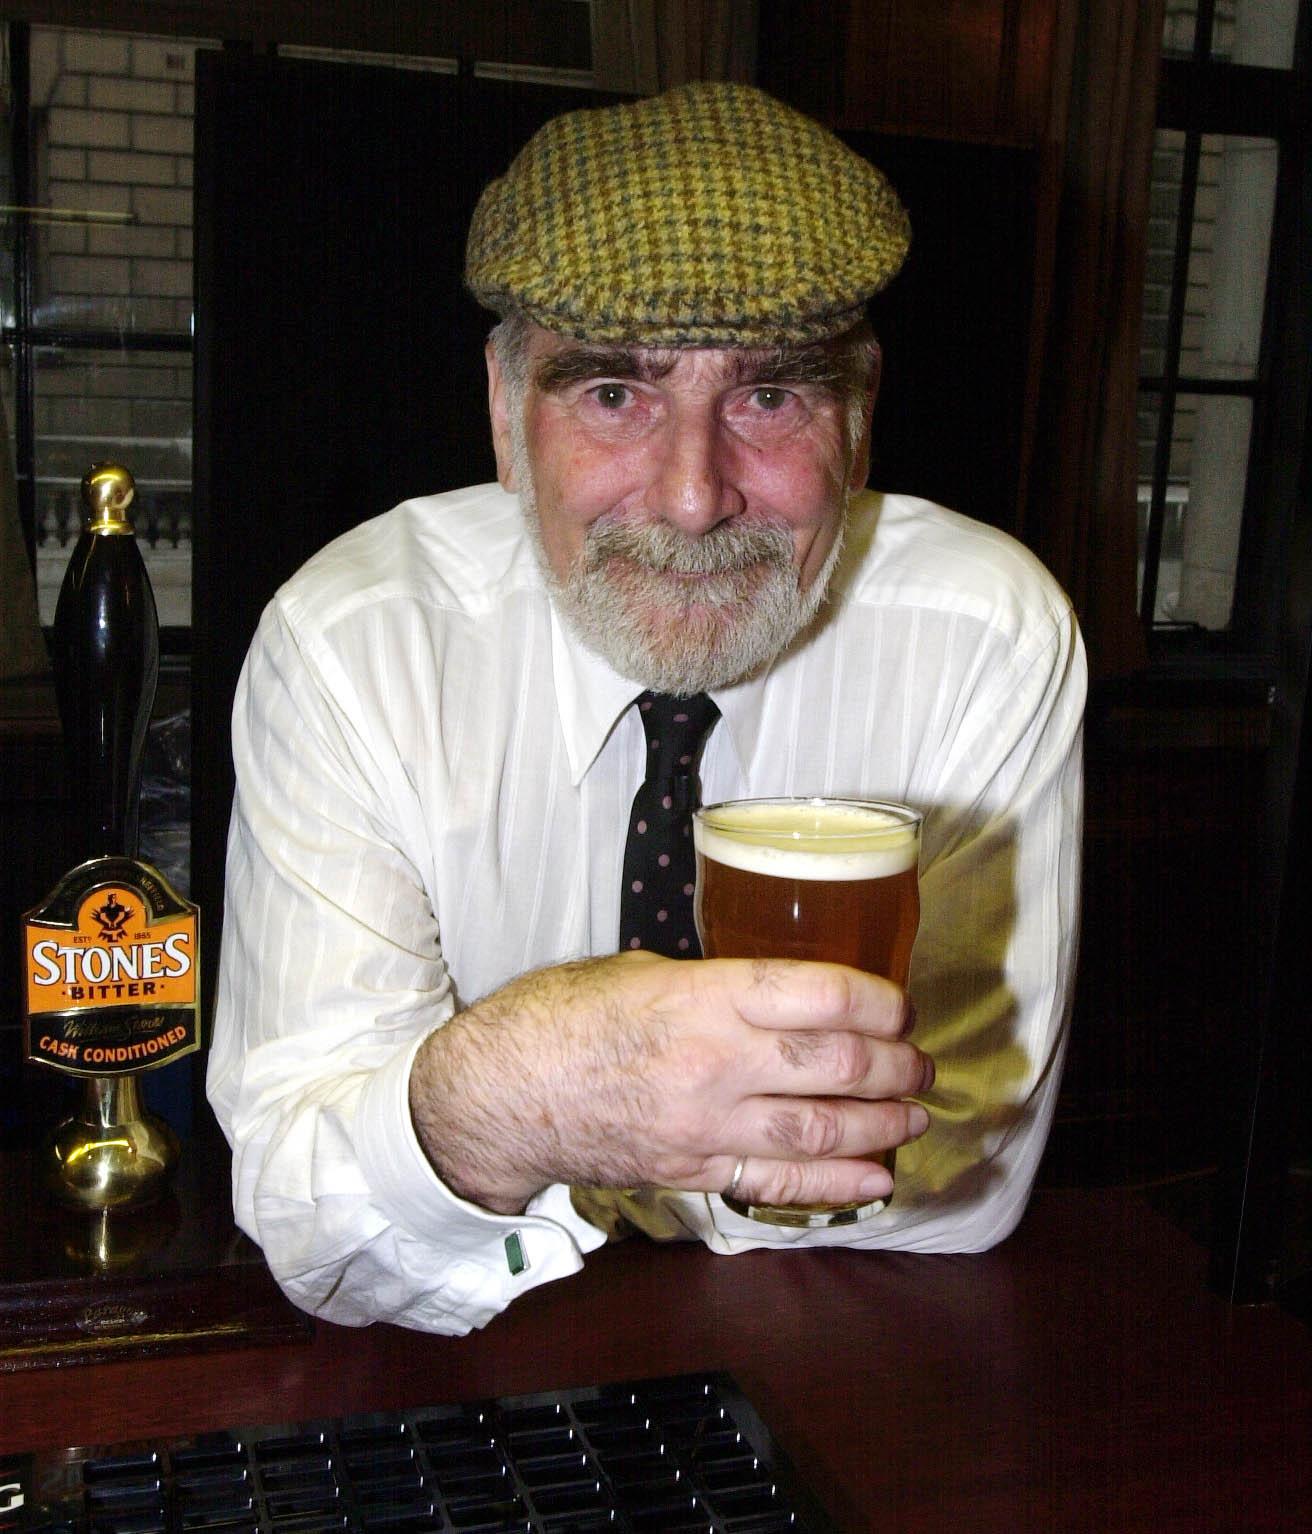 The Archers' Joe Grundy, actor Edward Kelsey, dies aged 88